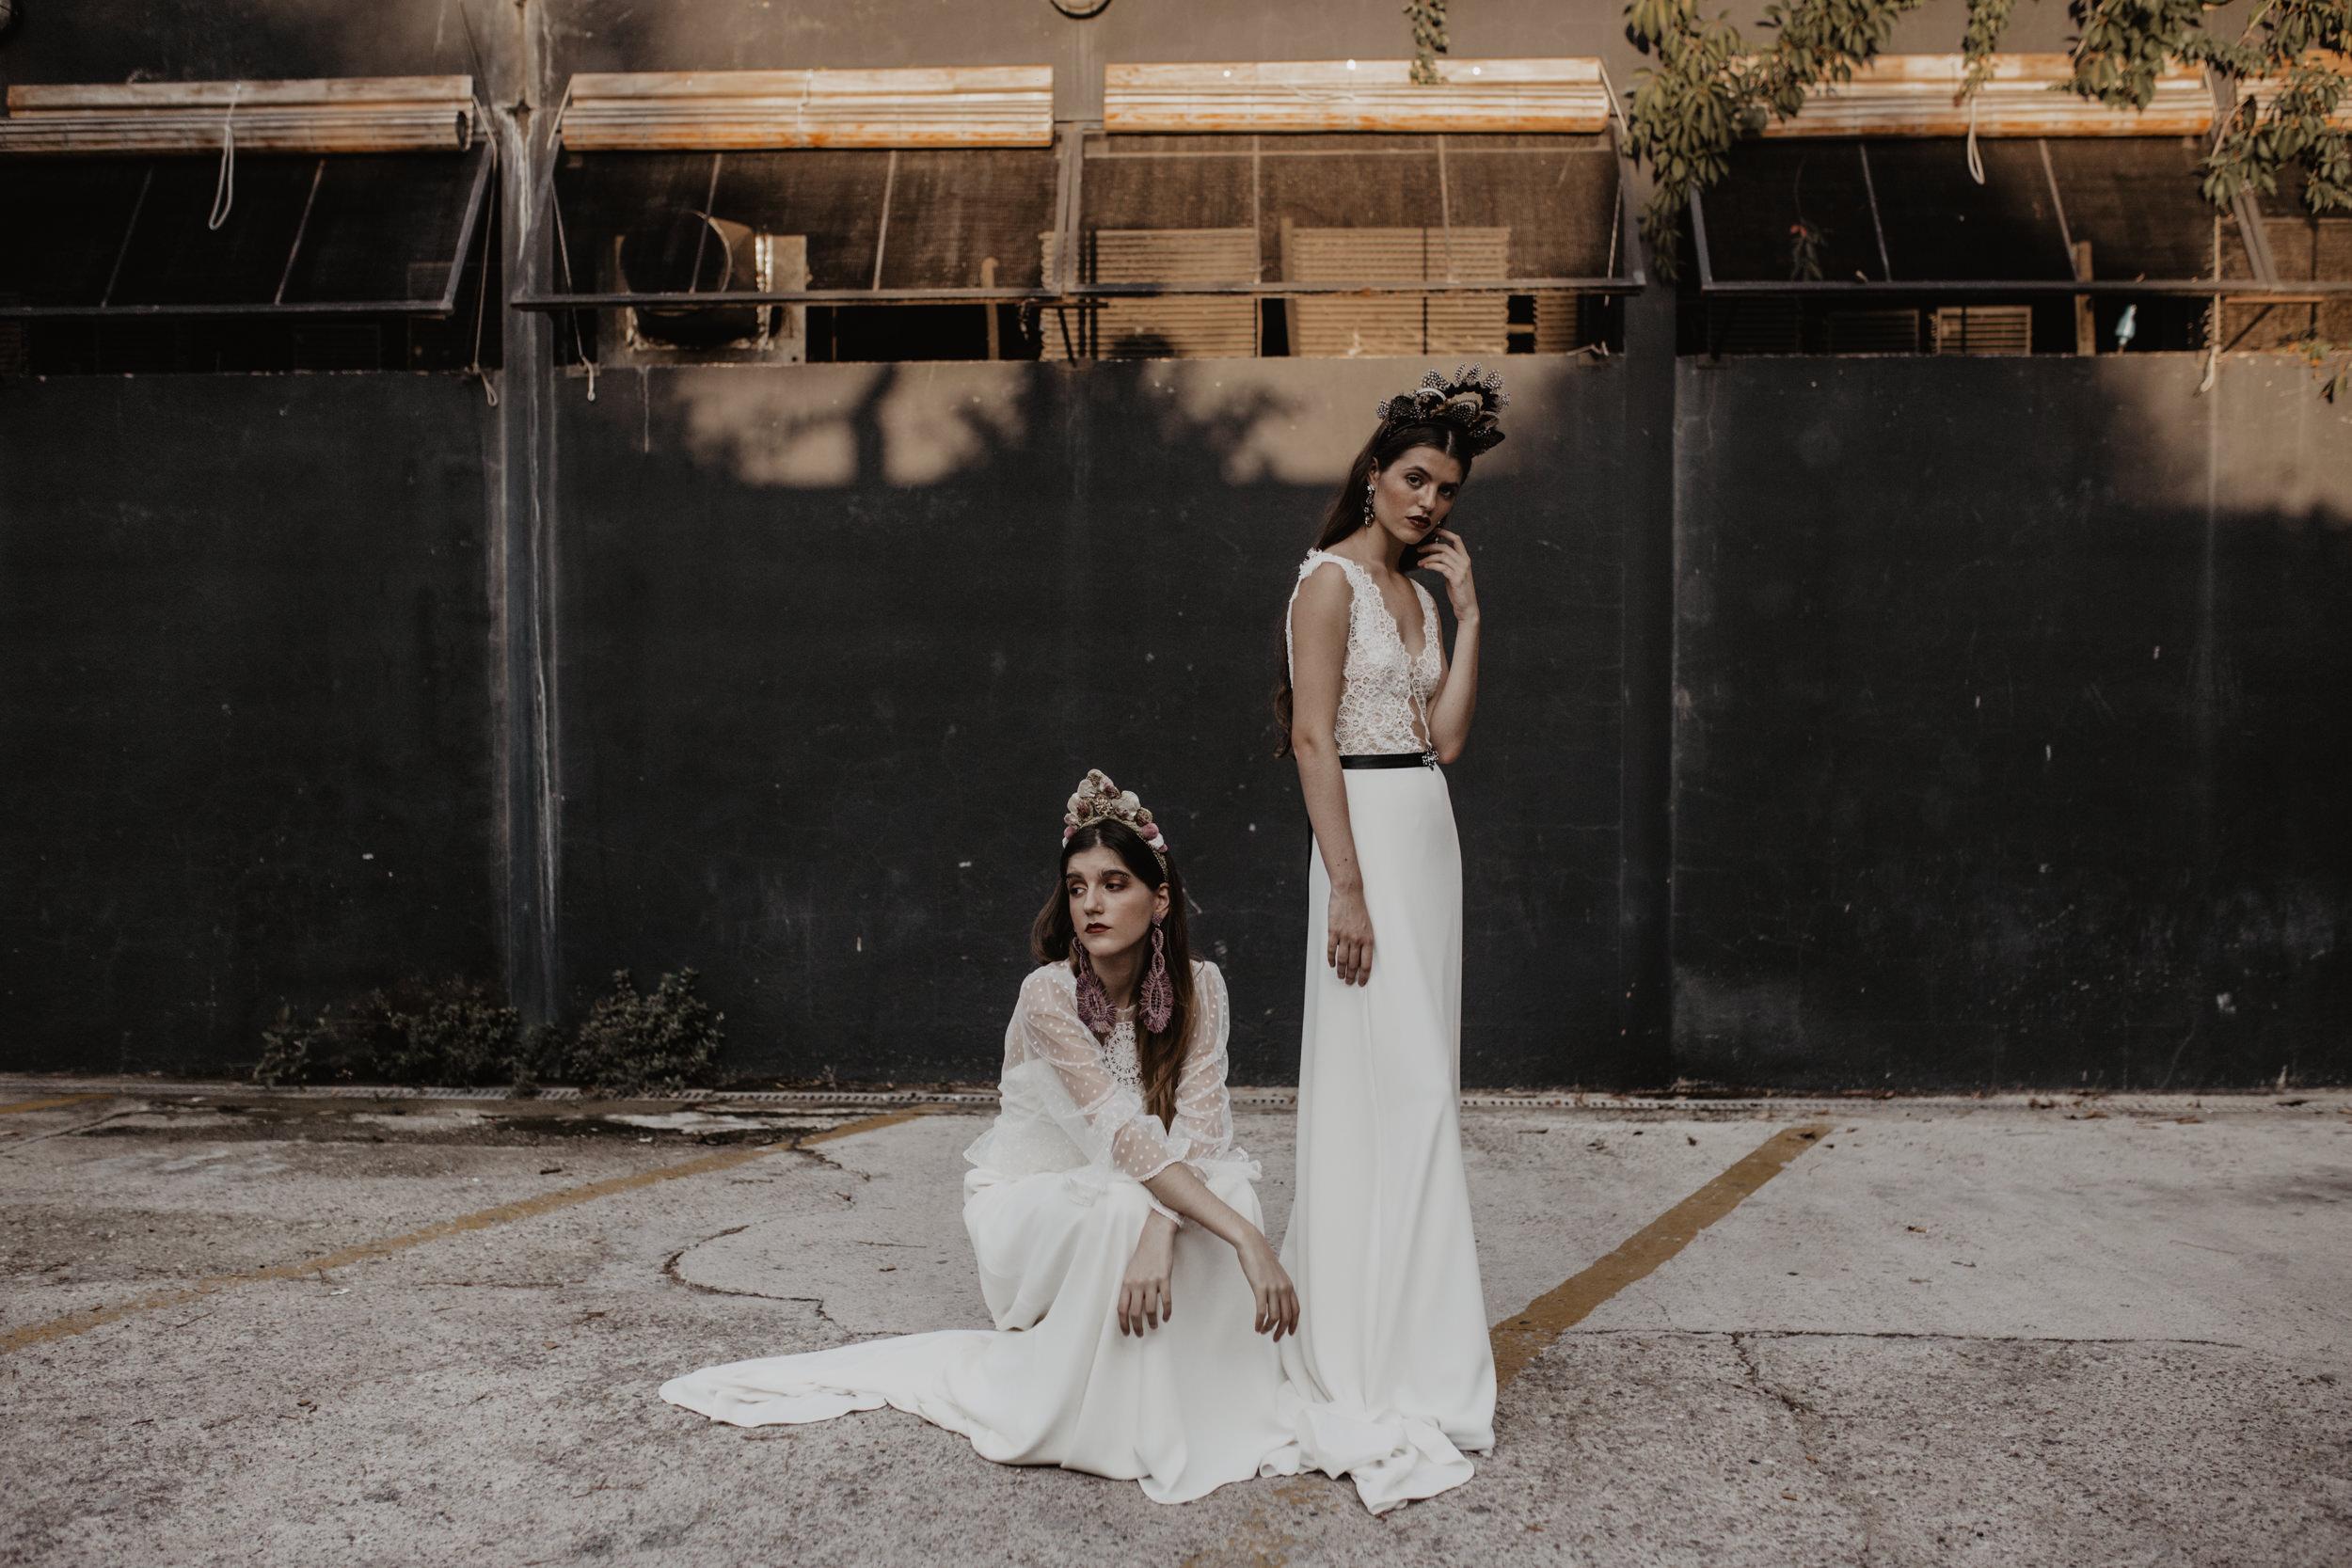 thenortherngirlphotography_photography_thenortherngirl_rebeccascabros_wedding_weddingphotography_weddingphotographer_barcelona_fashionbarcelona_unconventionalwedding_lacasademuñecas-233.jpg